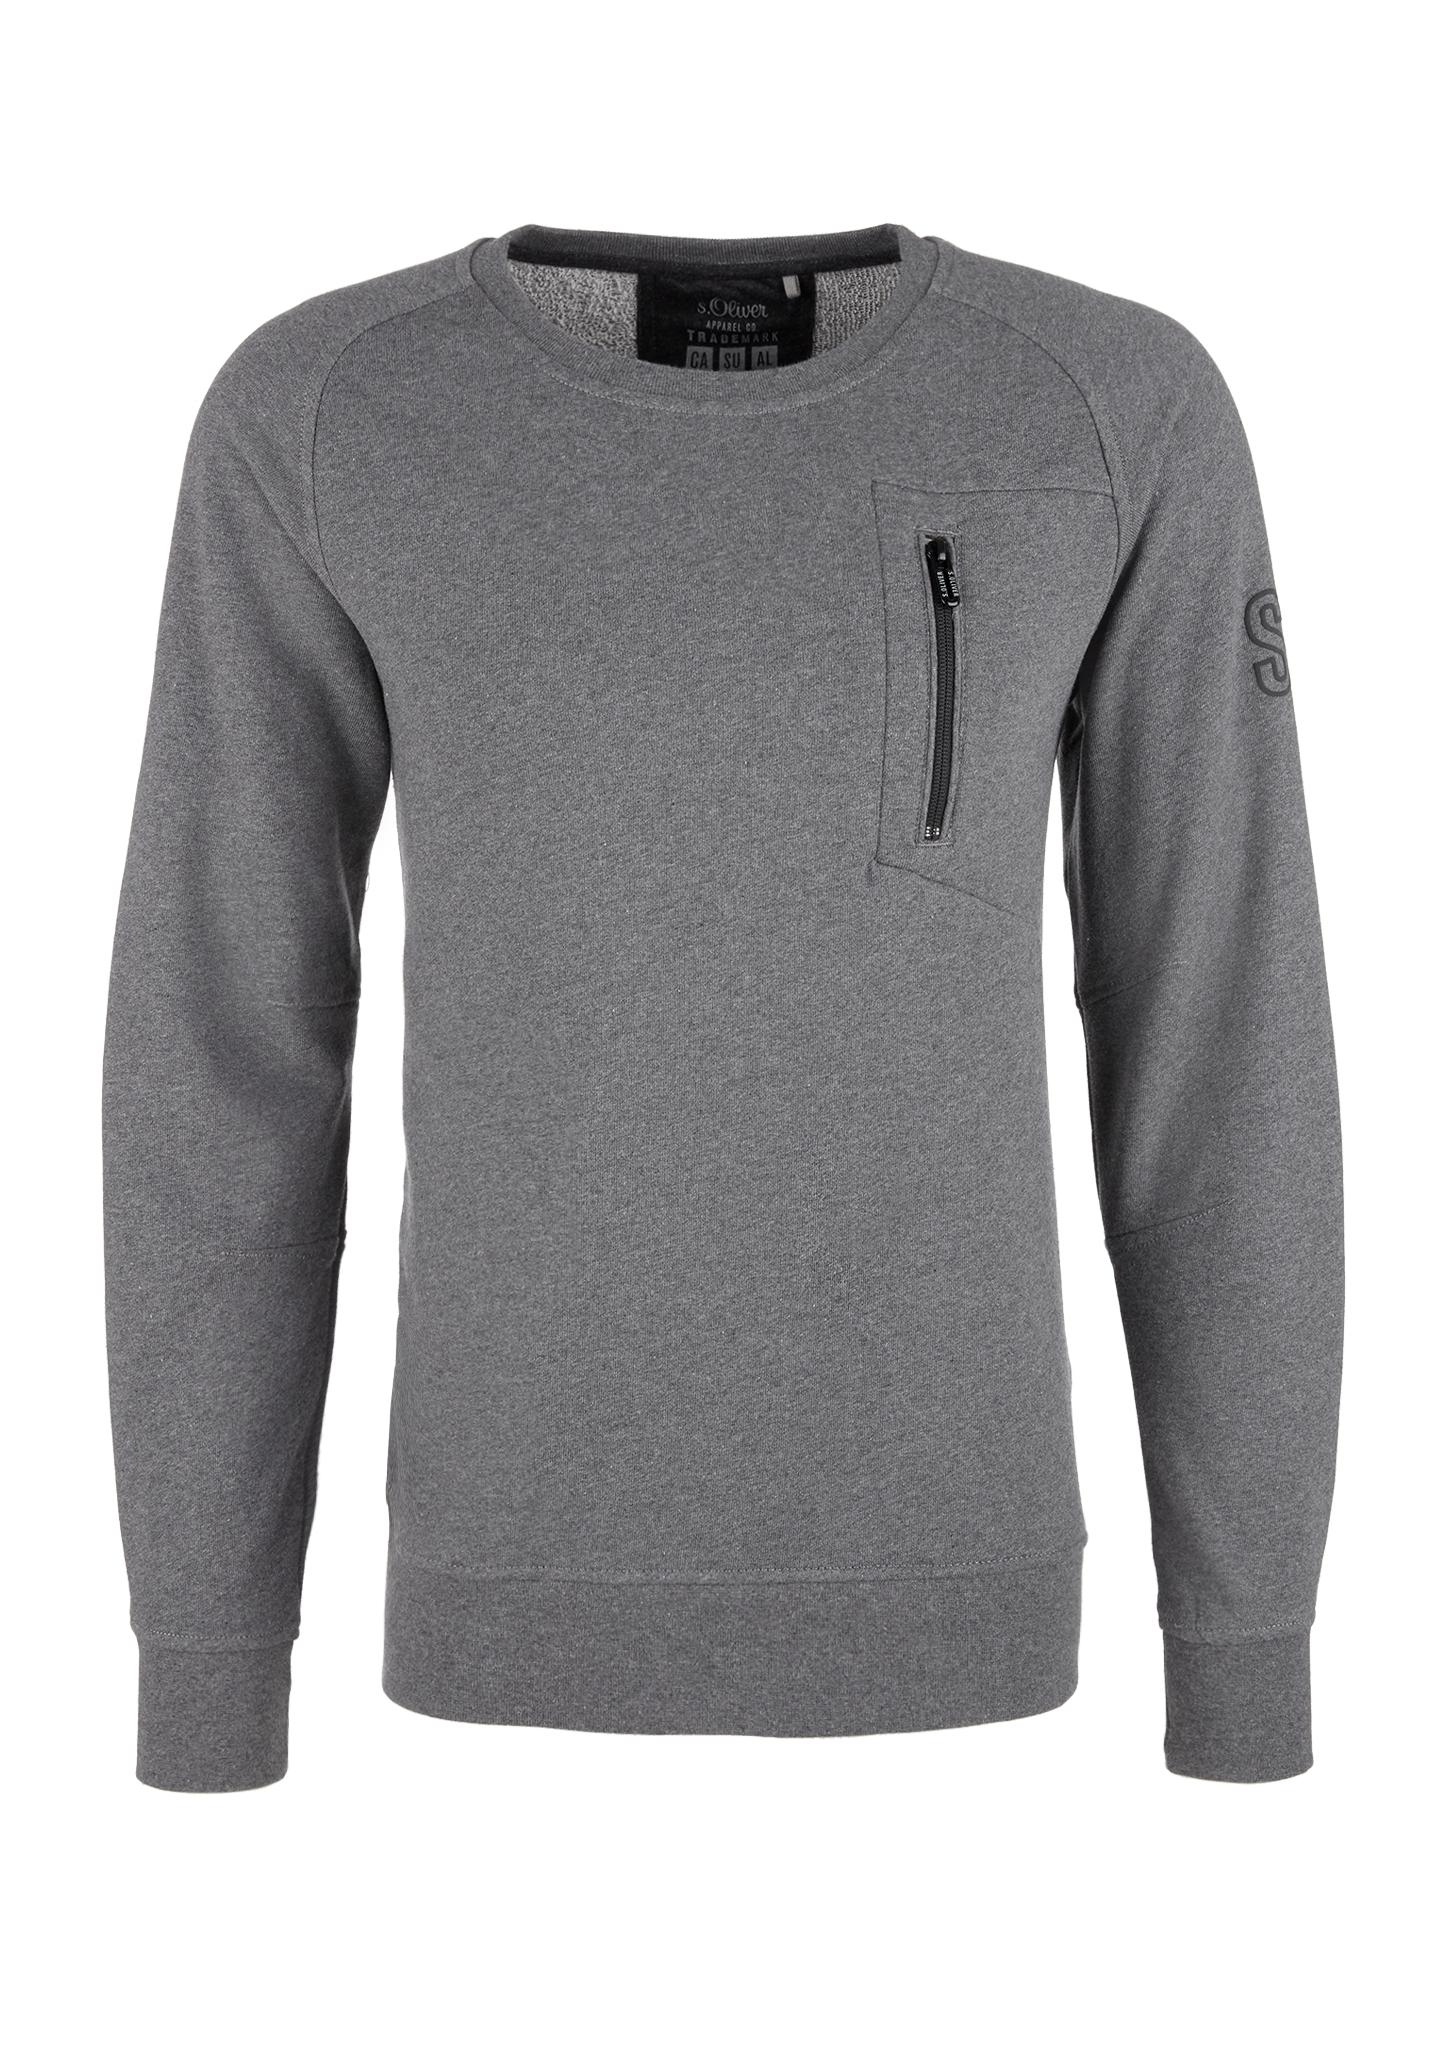 Sweatshirt | Bekleidung > Sweatshirts & -jacken > Sweatshirts | Grau | 100% baumwolle | s.Oliver